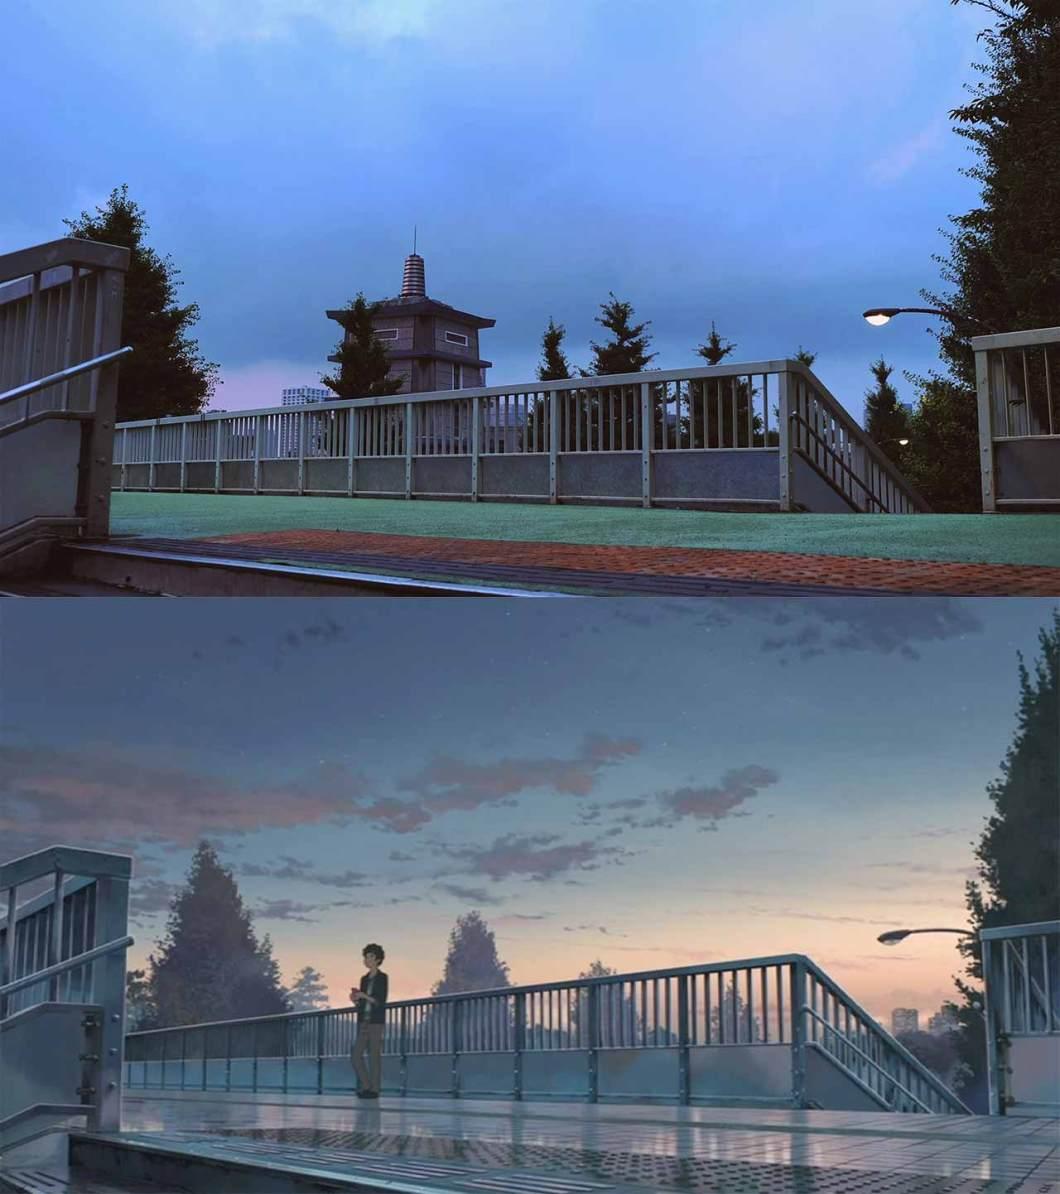 pedestrian bridge in your name